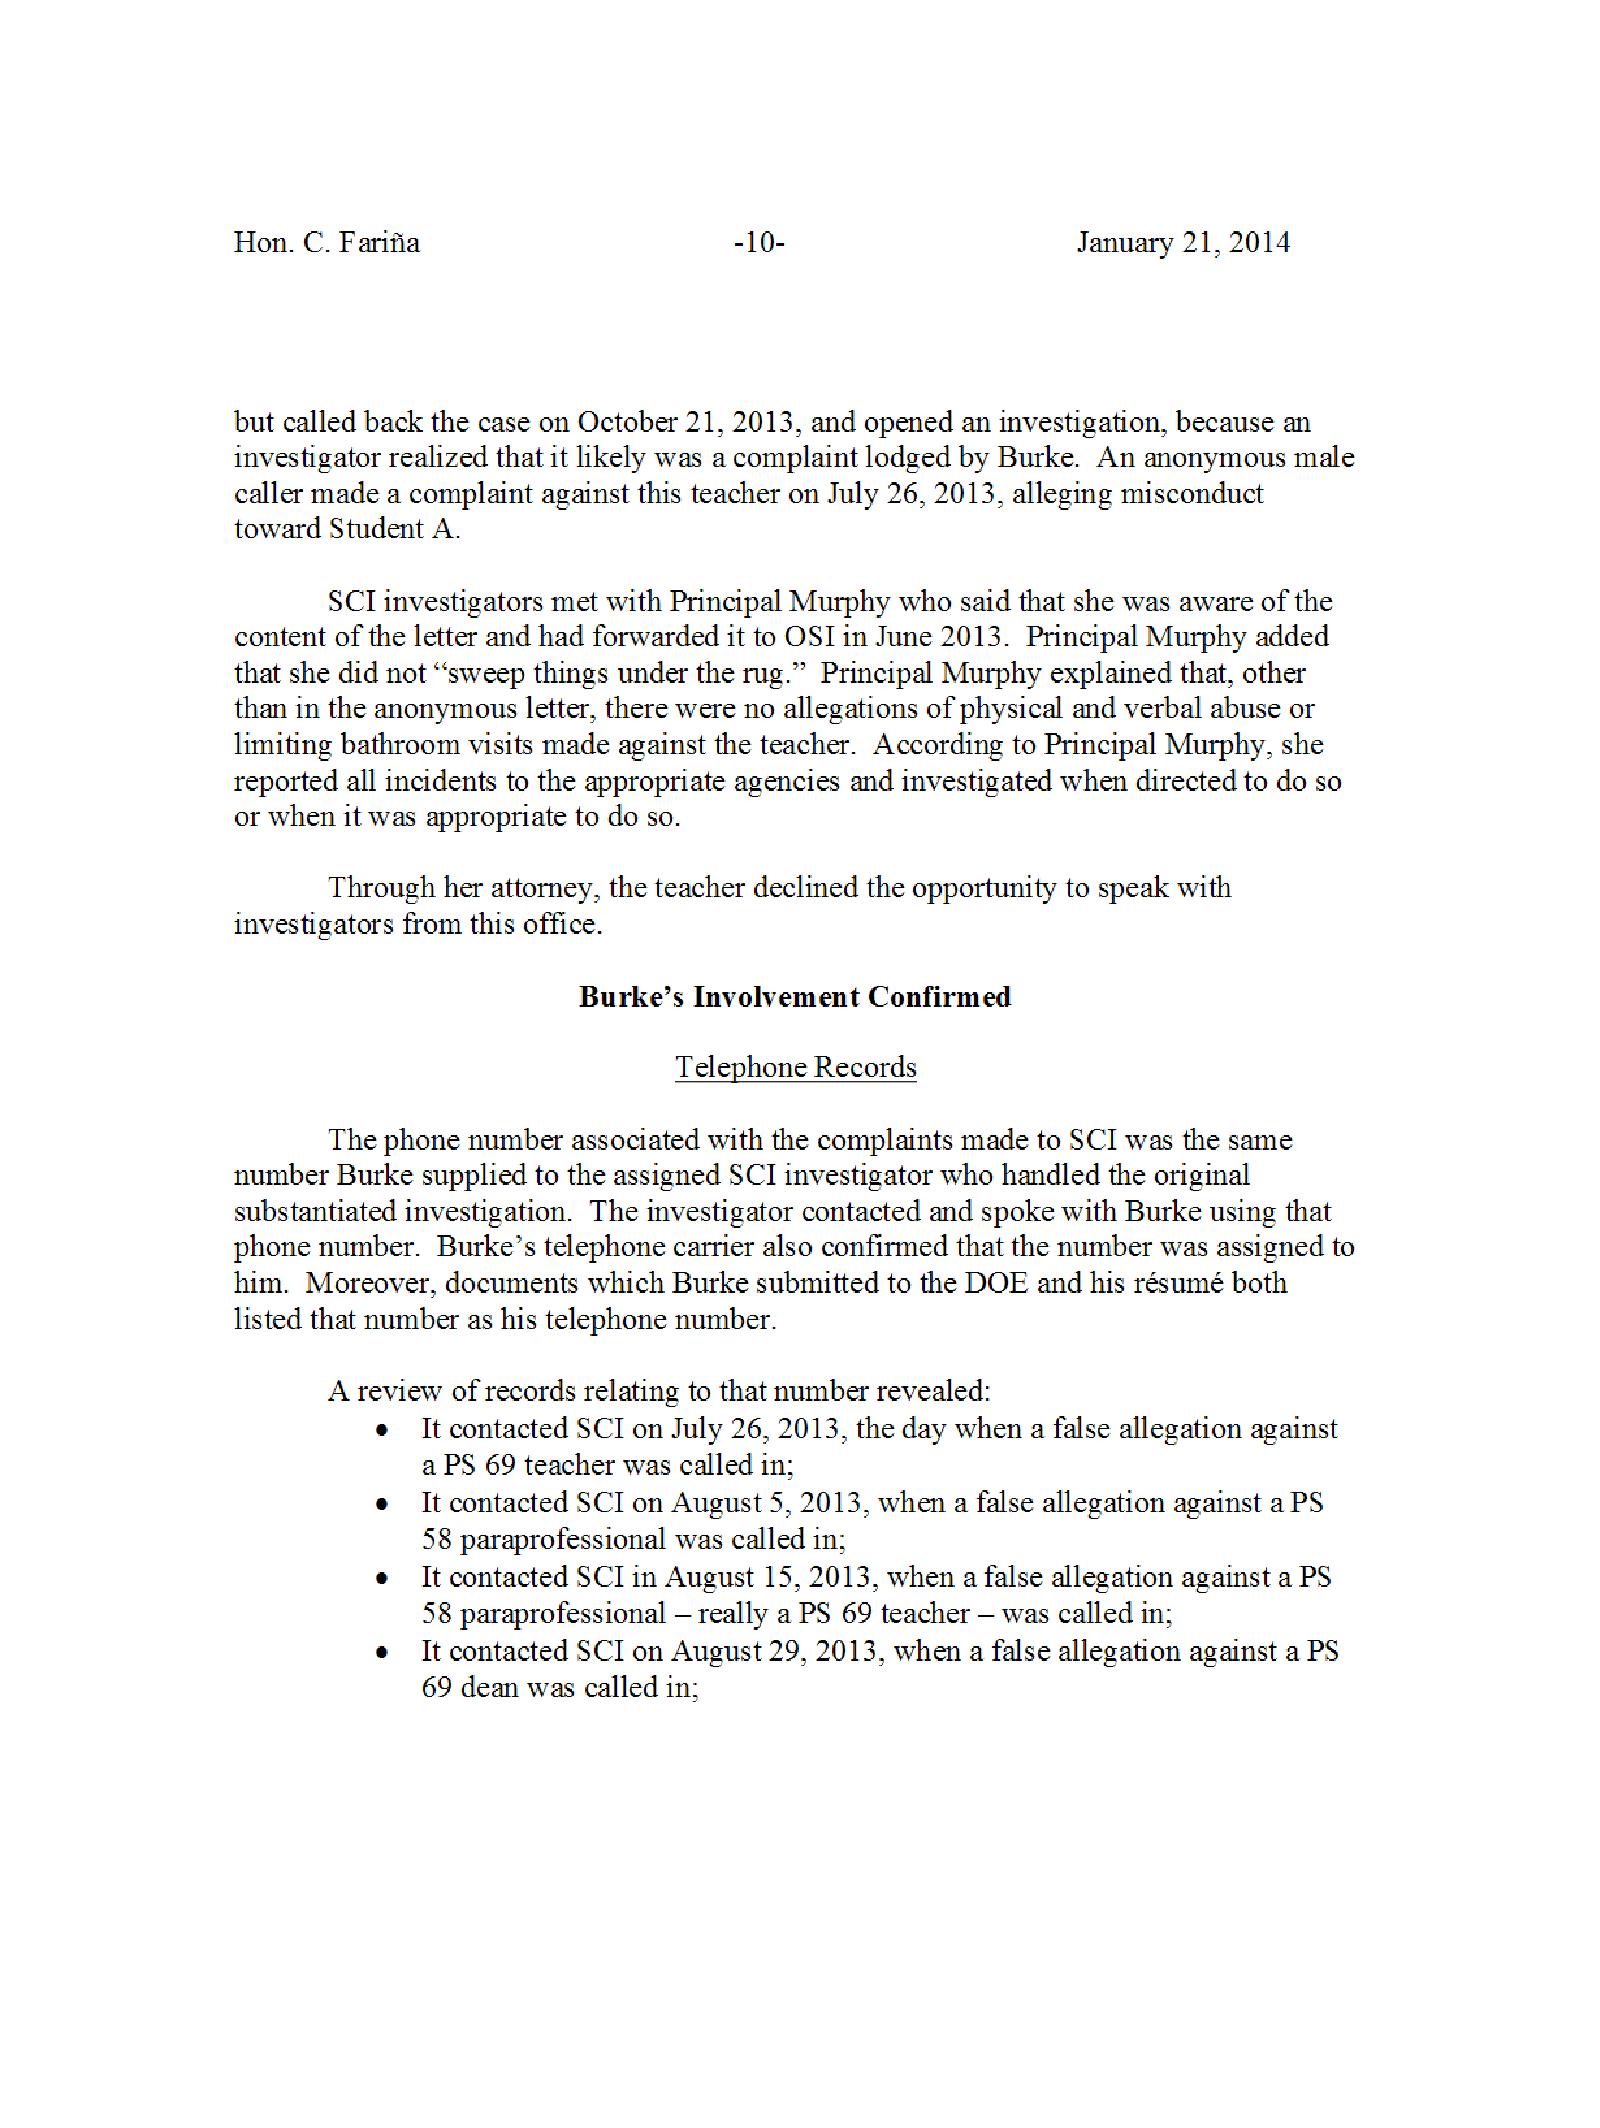 Copy of 1-22-2014 9-25-02 AM10.png